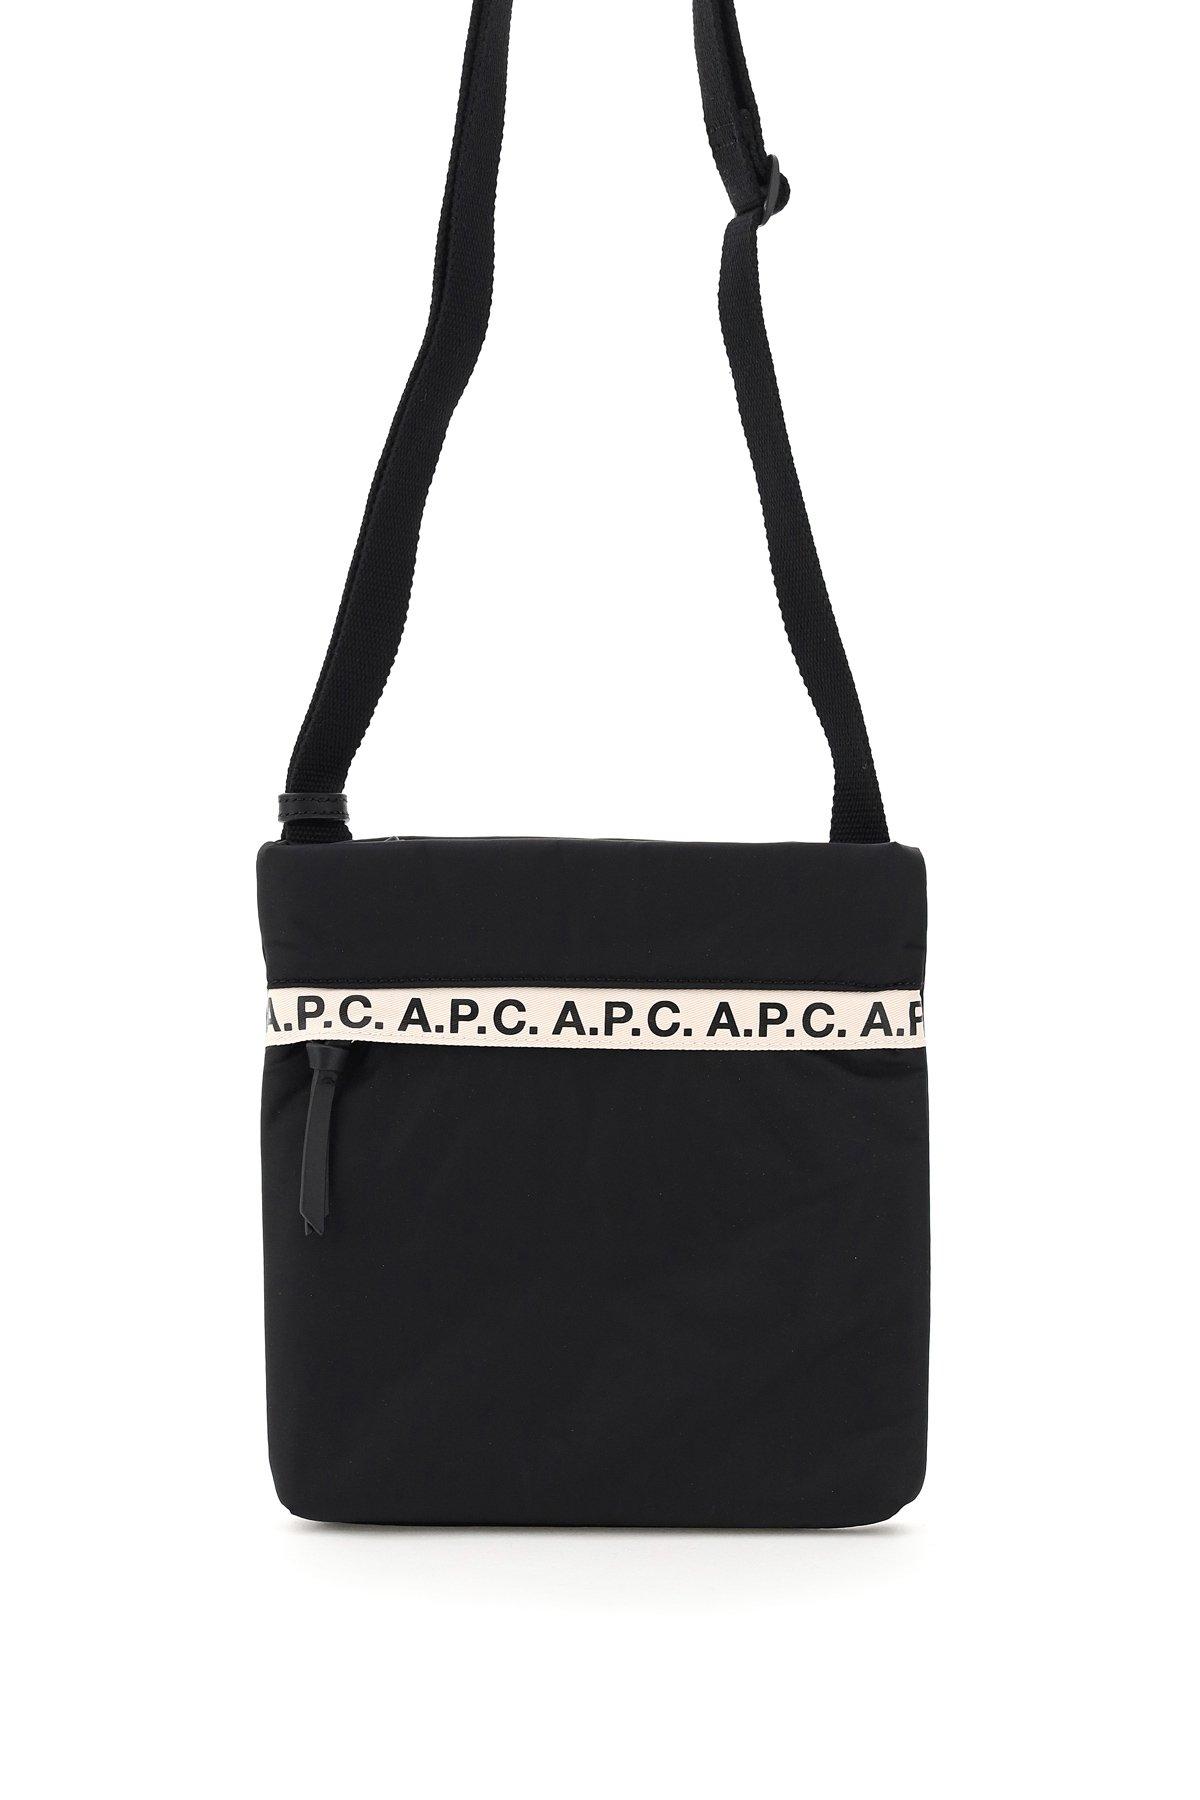 A.p.c. messenger sacoche repeat logo